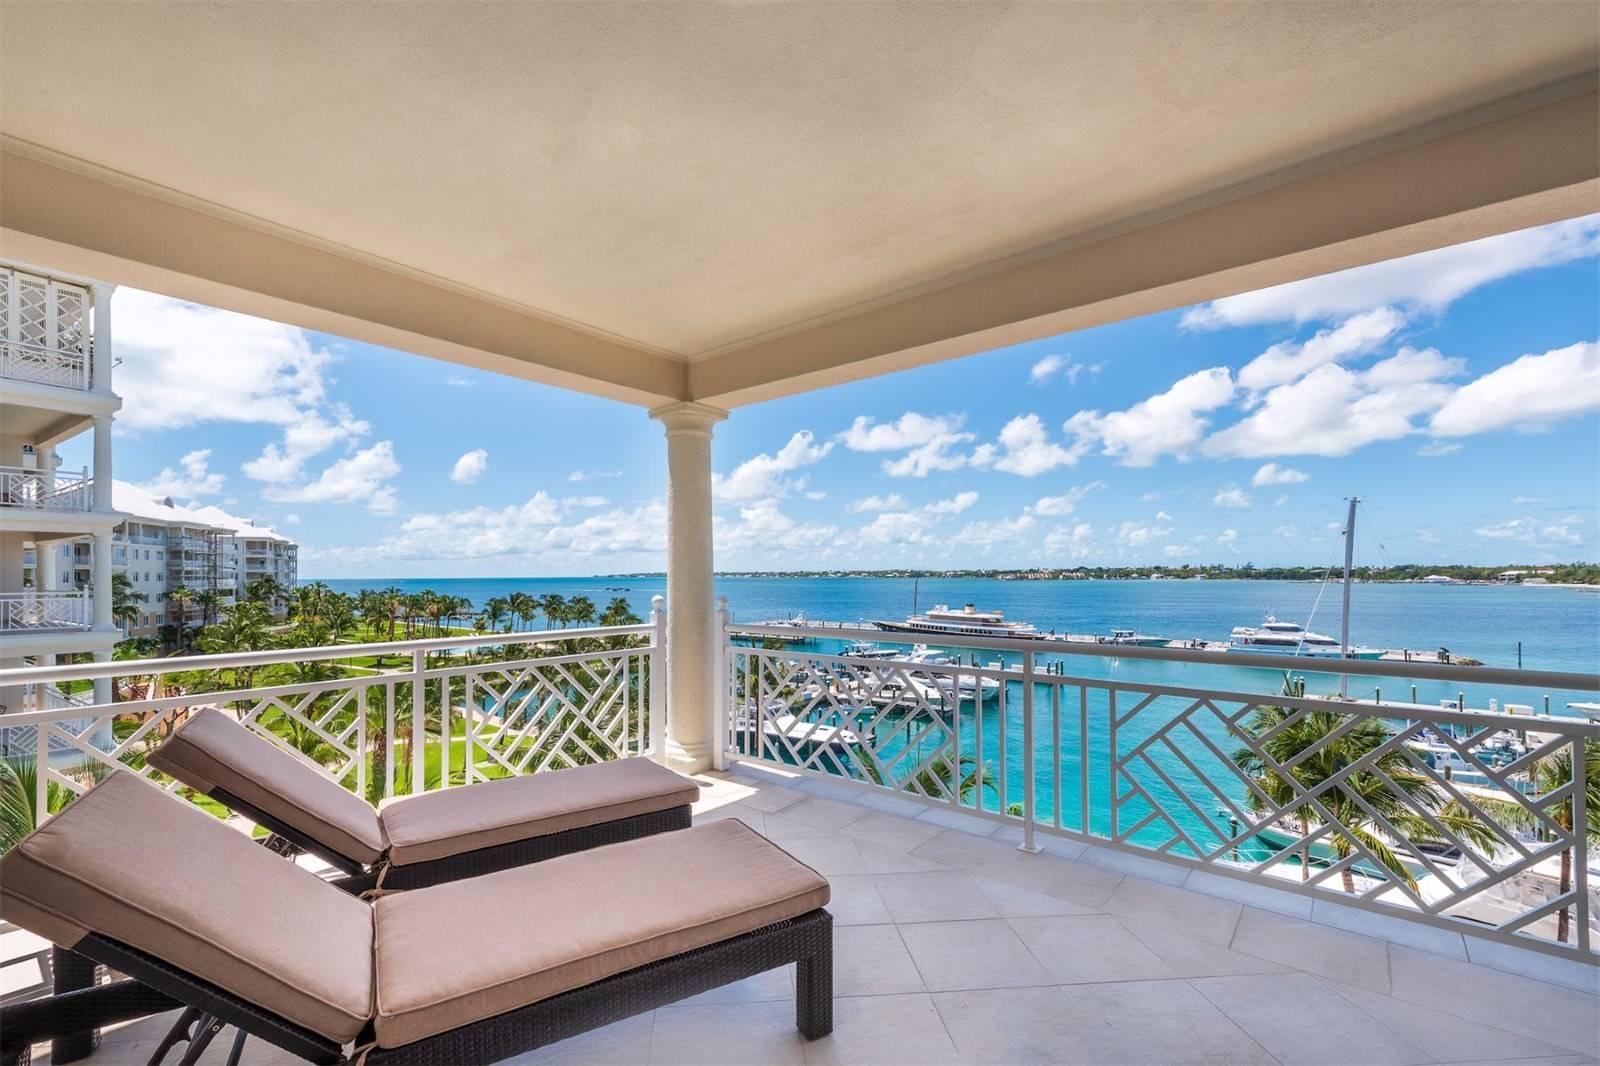 Ocean Club Residences & Marina D4.1 | Paradise Island, Bahamas